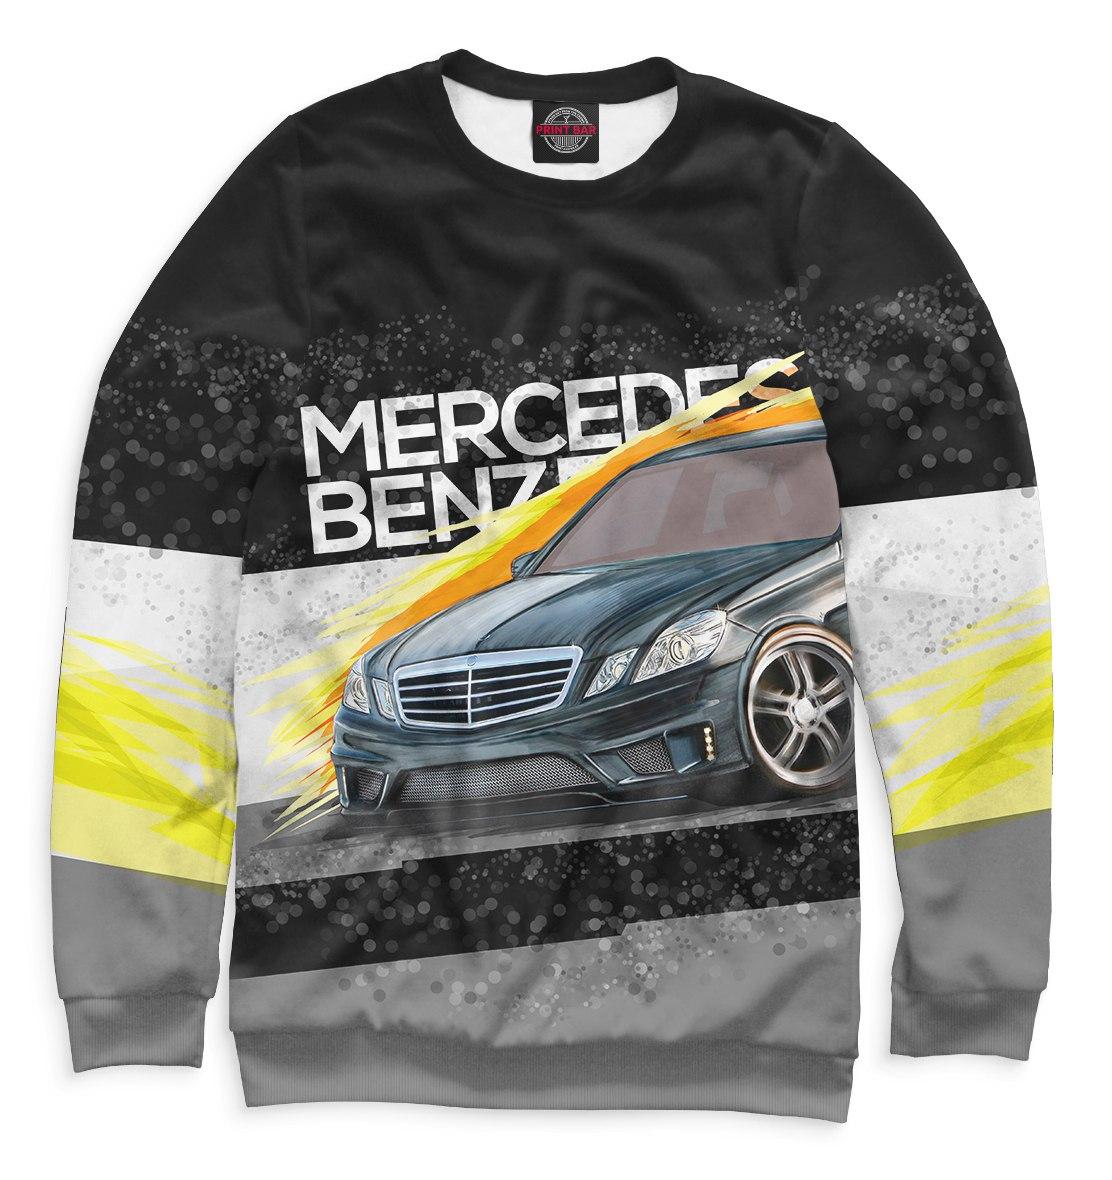 Купить Mercedes-benz E-class, Printbar, Свитшоты, MER-608463-swi-1